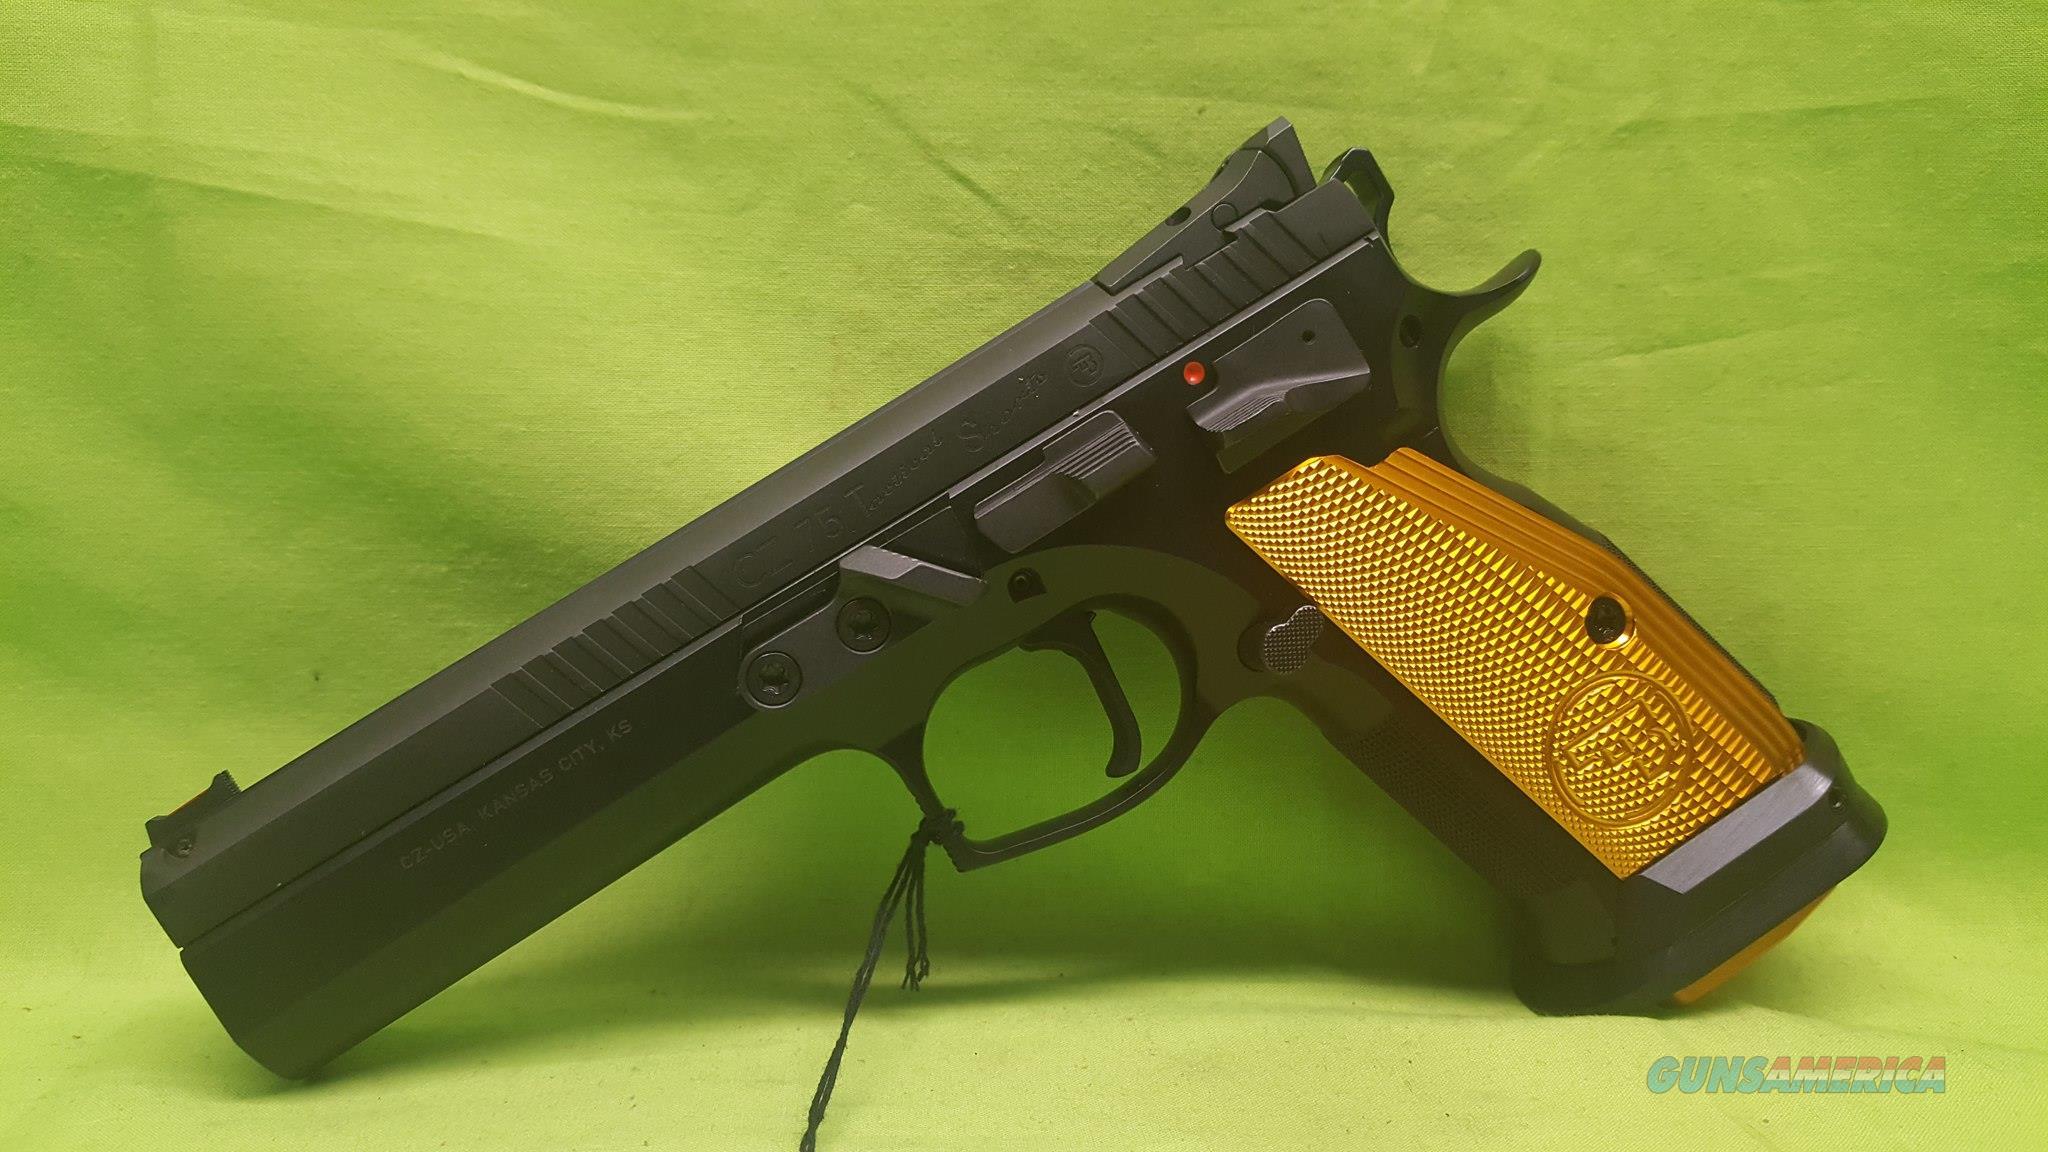 CZ 75 TACTICAL SPORT ORANGE 9 MM 9MM 91261 TACT  Guns > Pistols > CZ Pistols